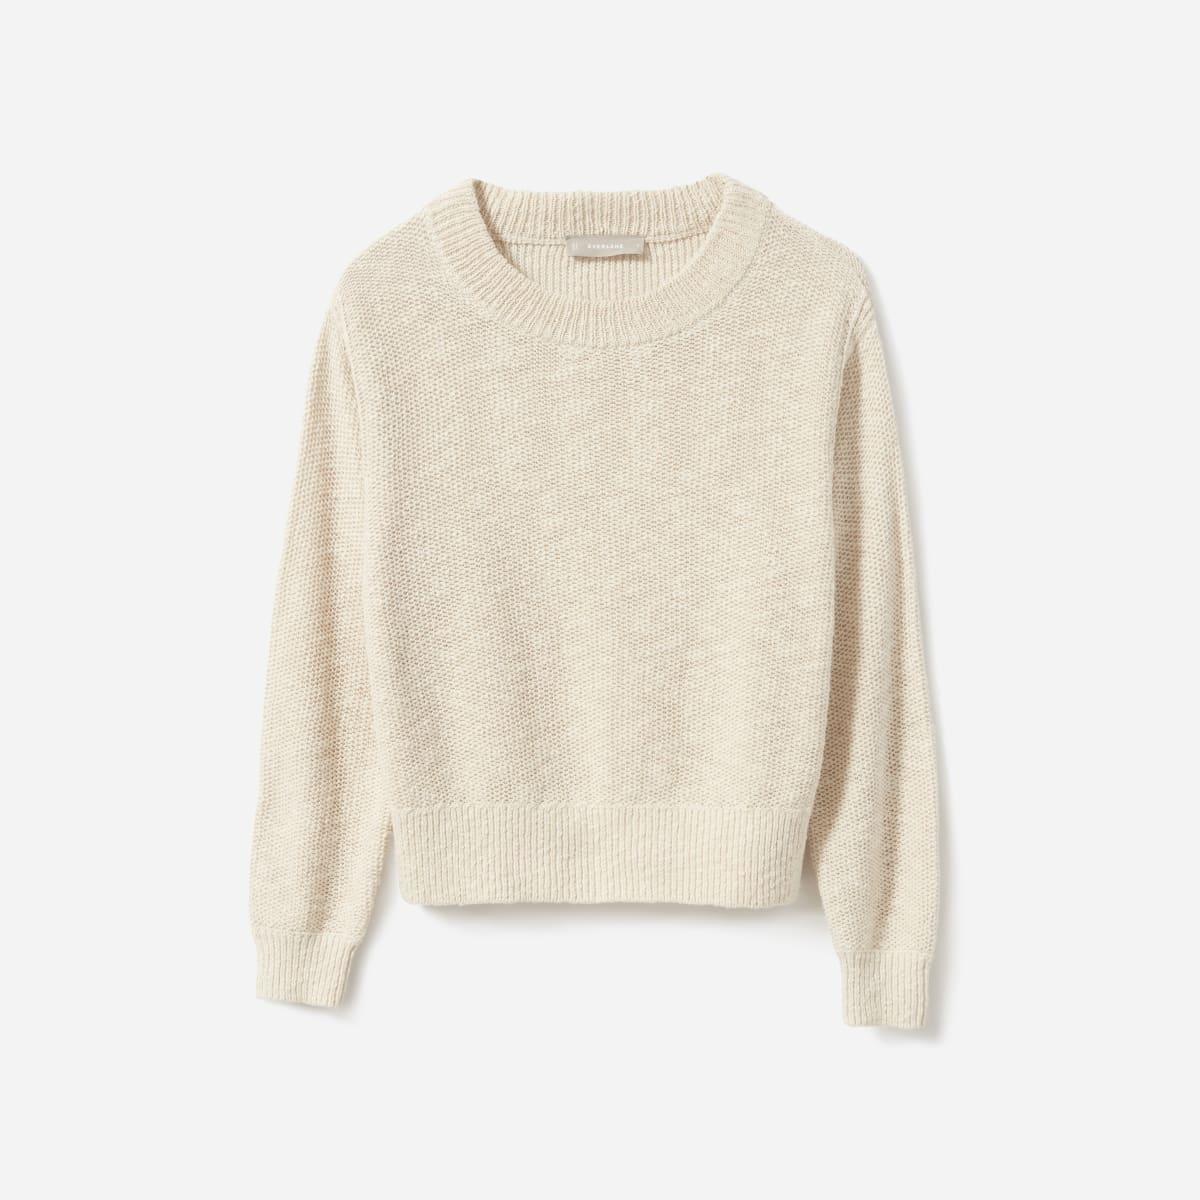 The Cotton-Linen Crew | Everlane